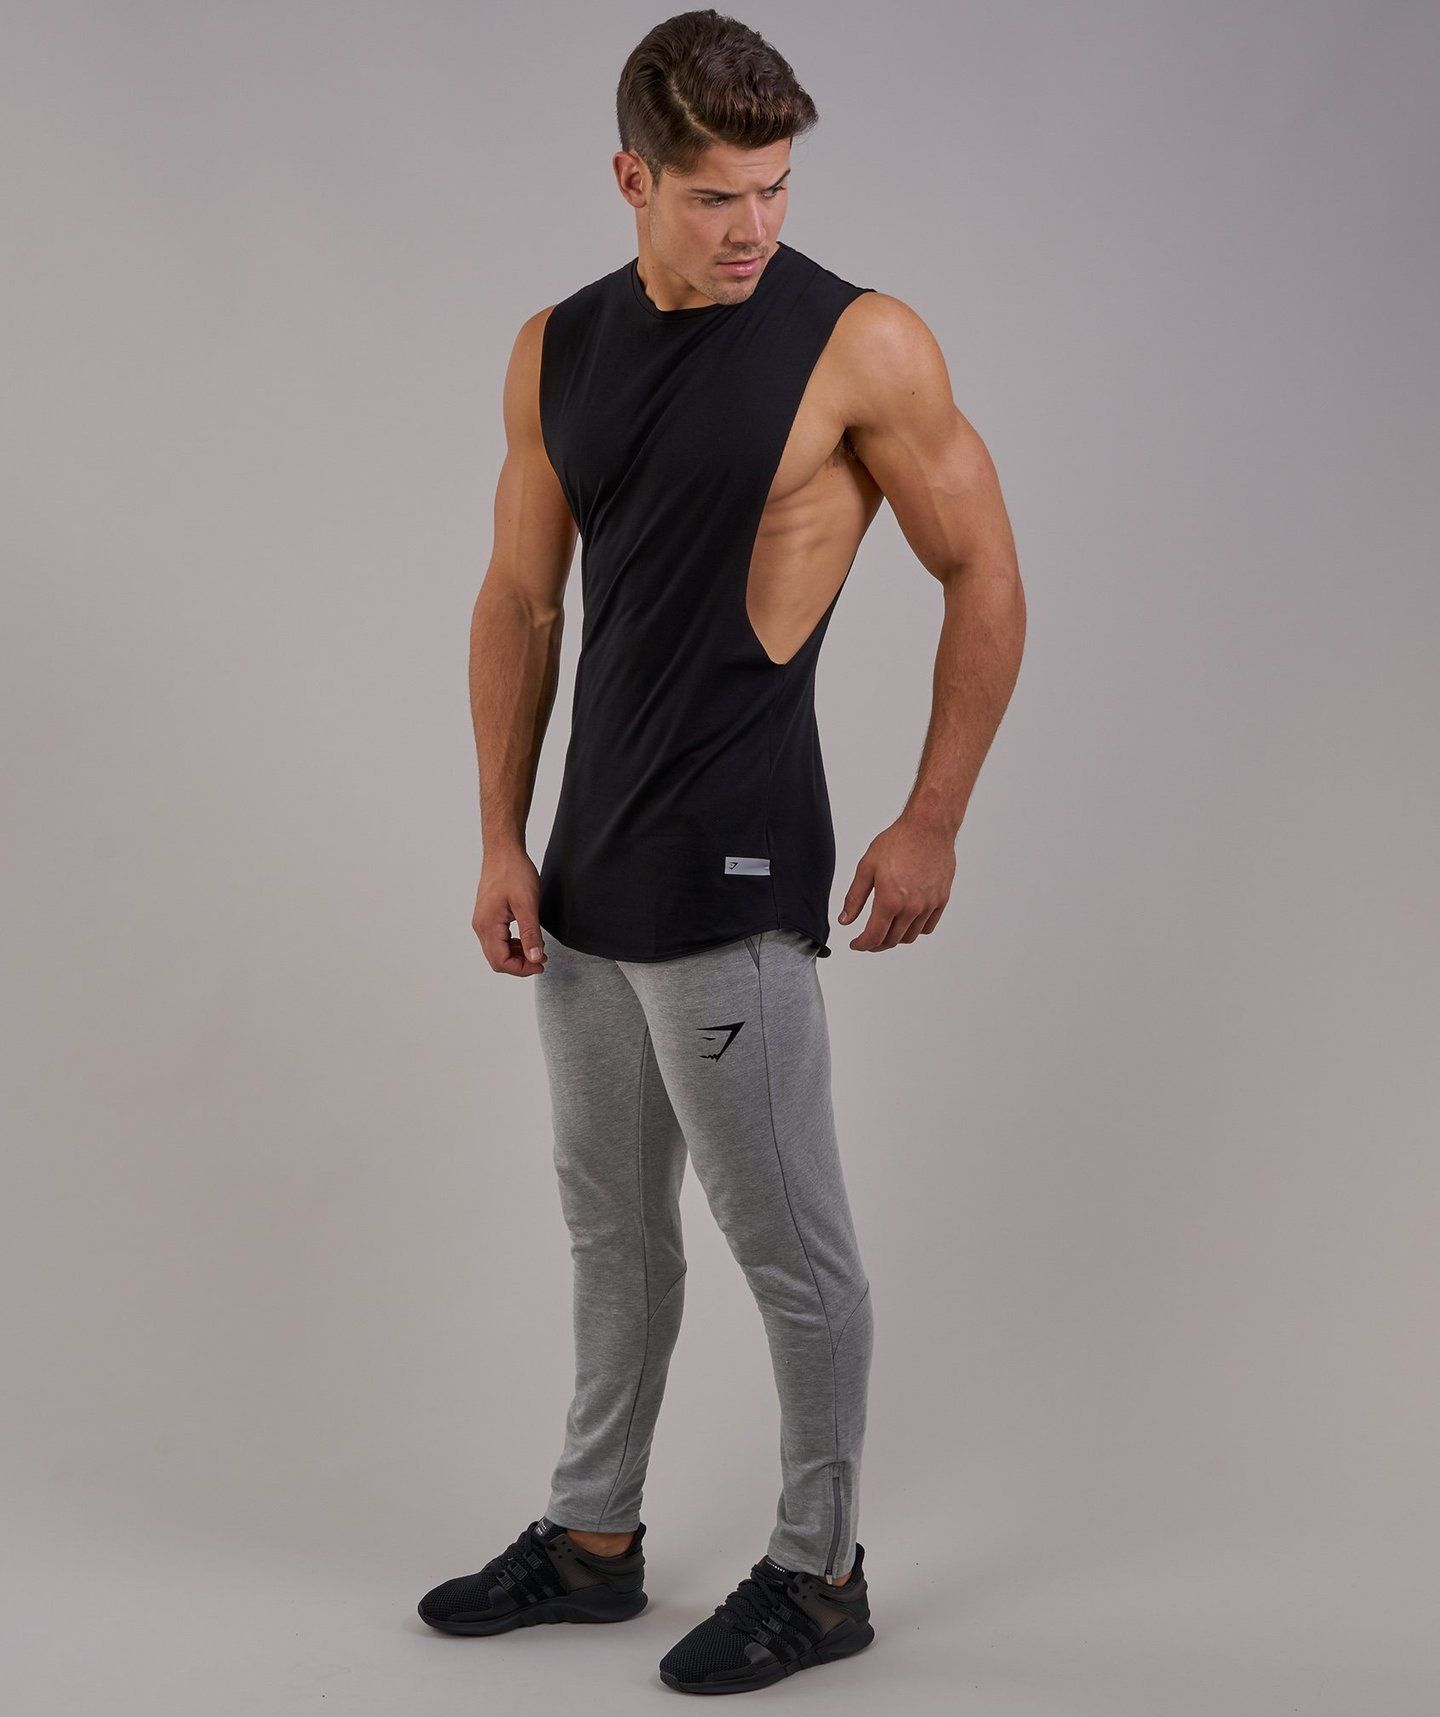 77d625ad2 Gymshark Eaze Sleeveless T-Shirt - Black 2